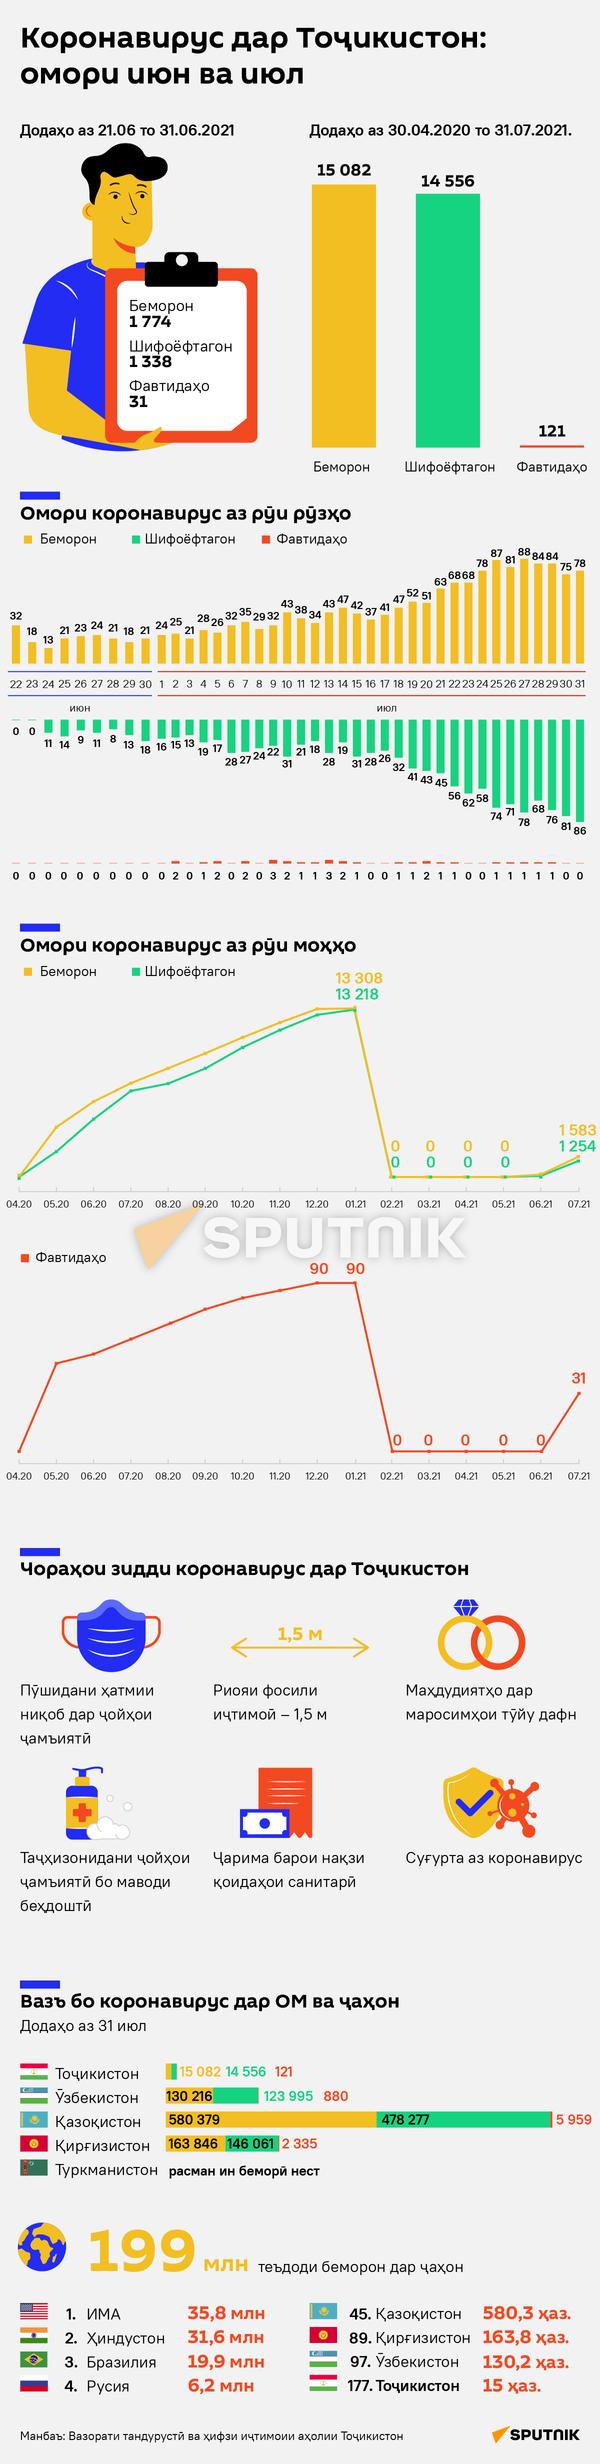 Коронавирус в Таджикистане: статистика за июнь и июль - Sputnik Тоҷикистон